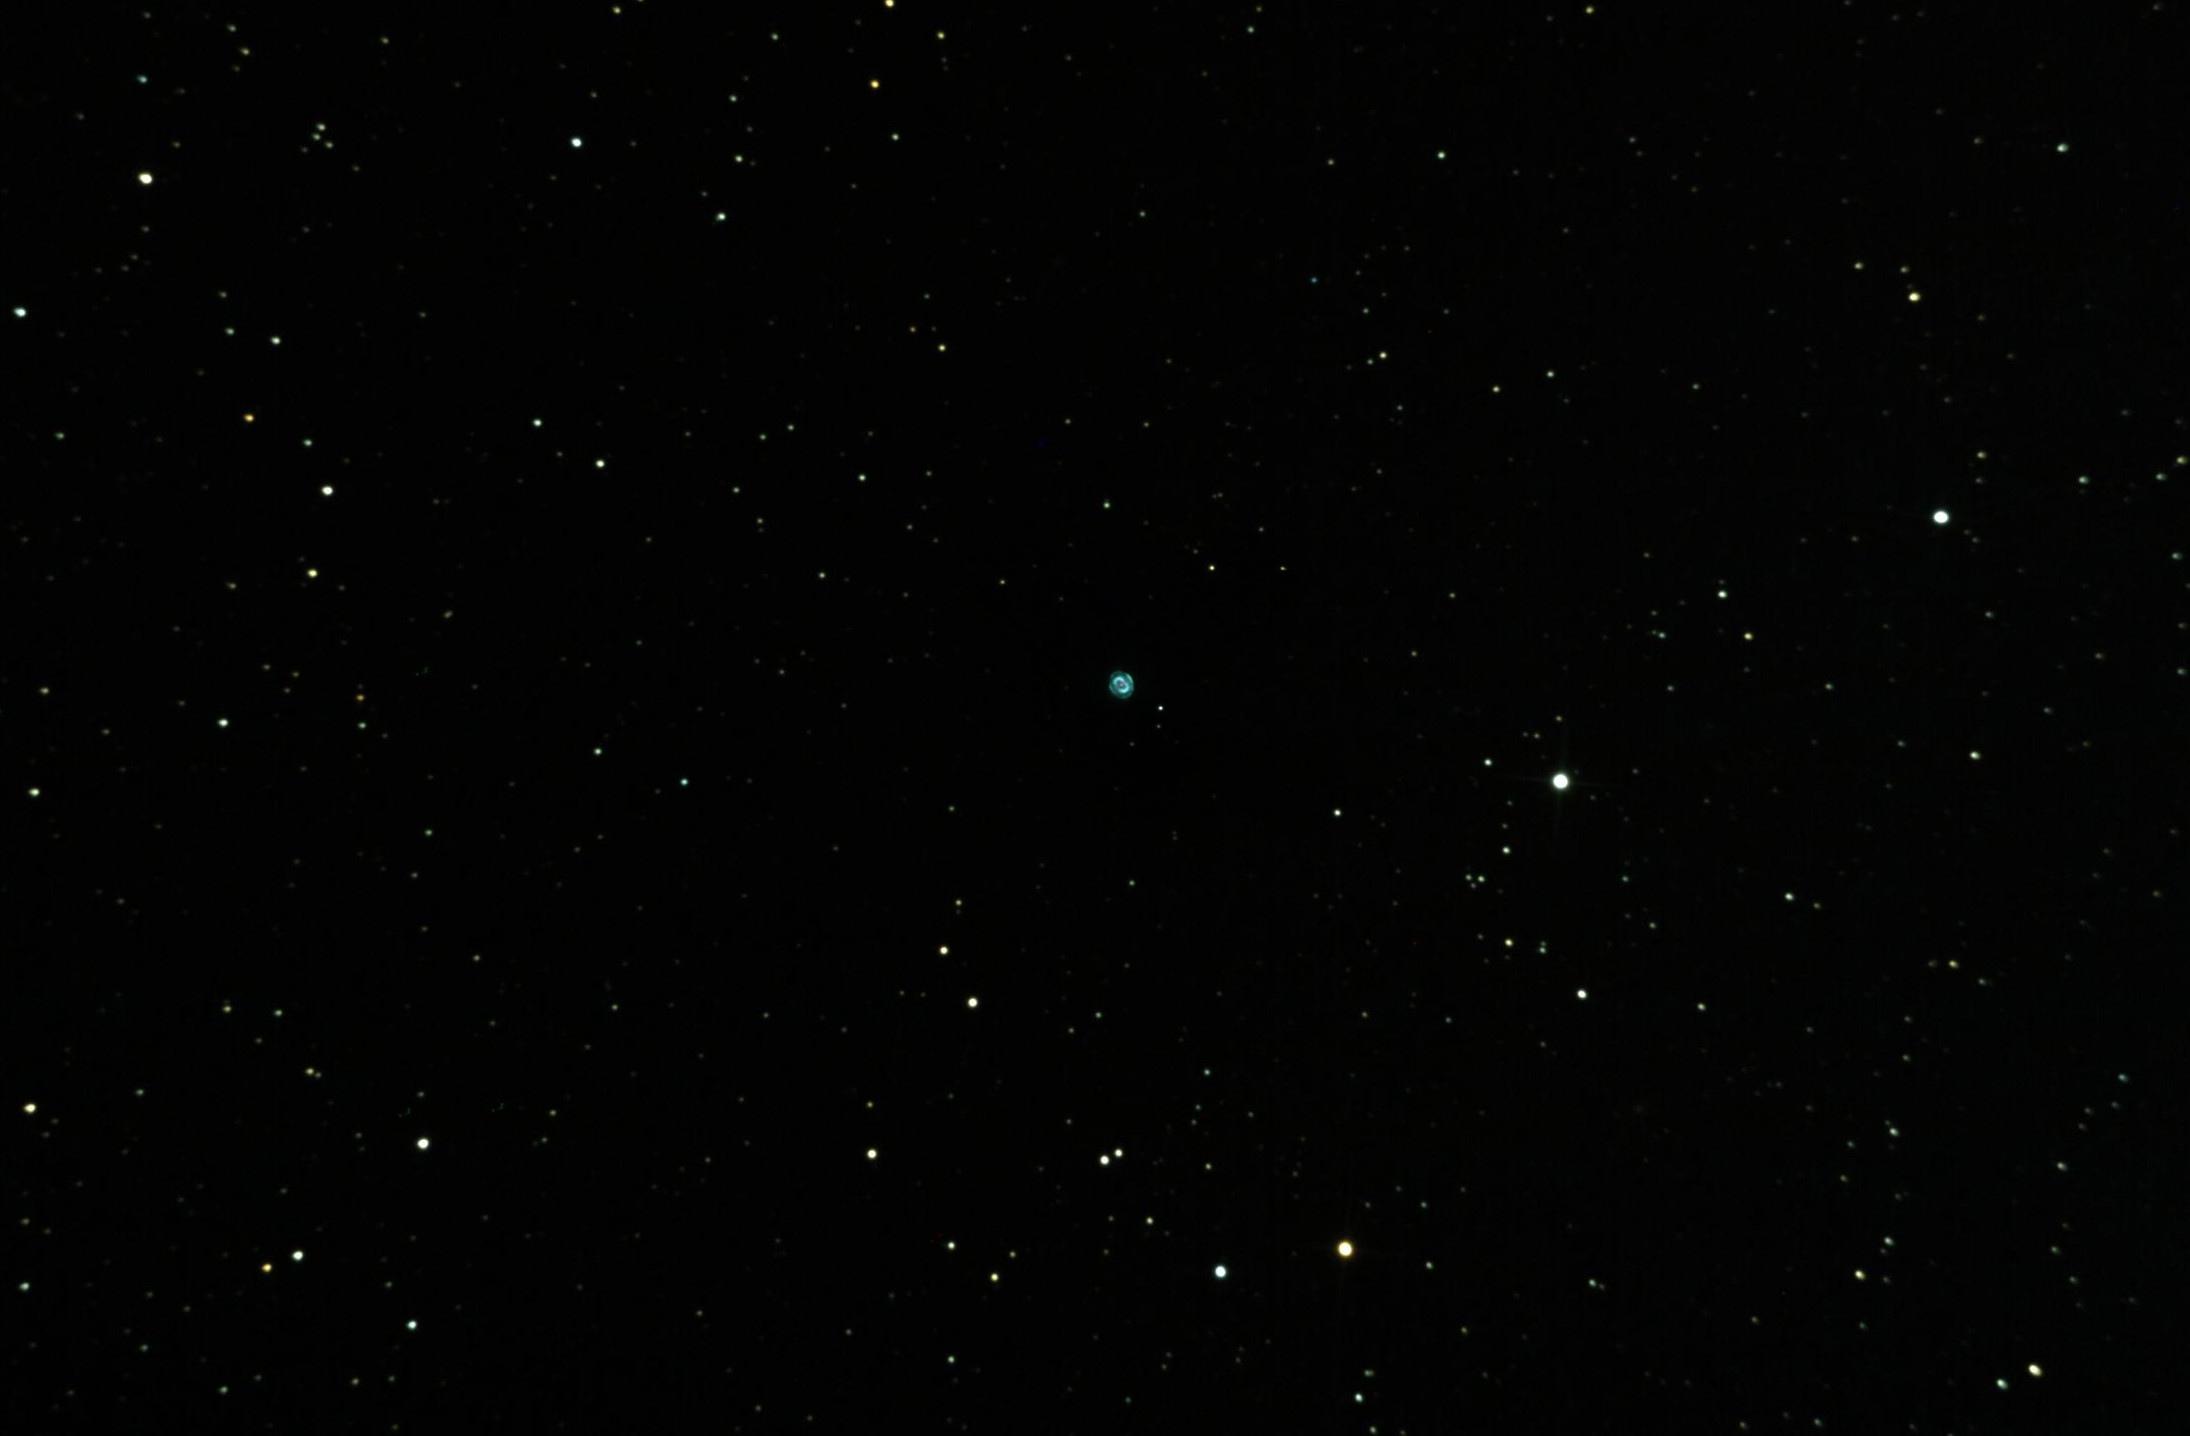 La boule de neige verte